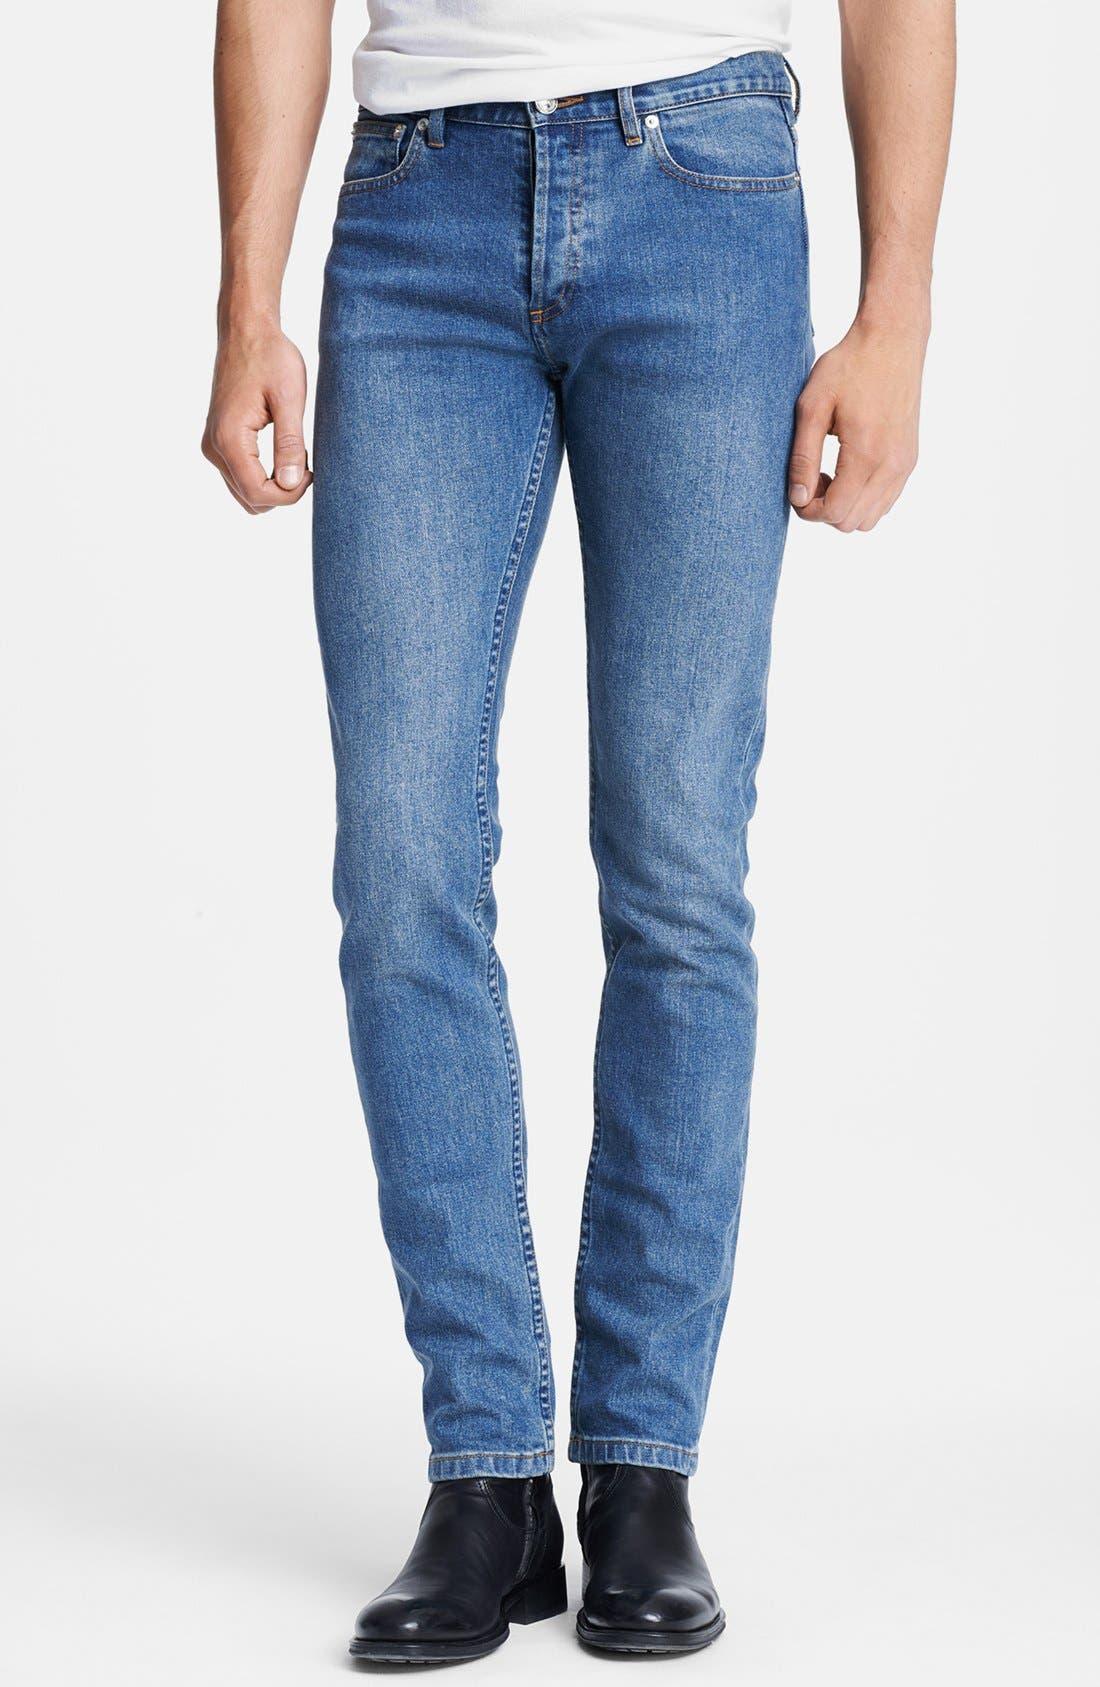 Alternate Image 1 Selected - A.P.C. 'Petit New Standard' Skinny Fit Jeans (Denim Blue)